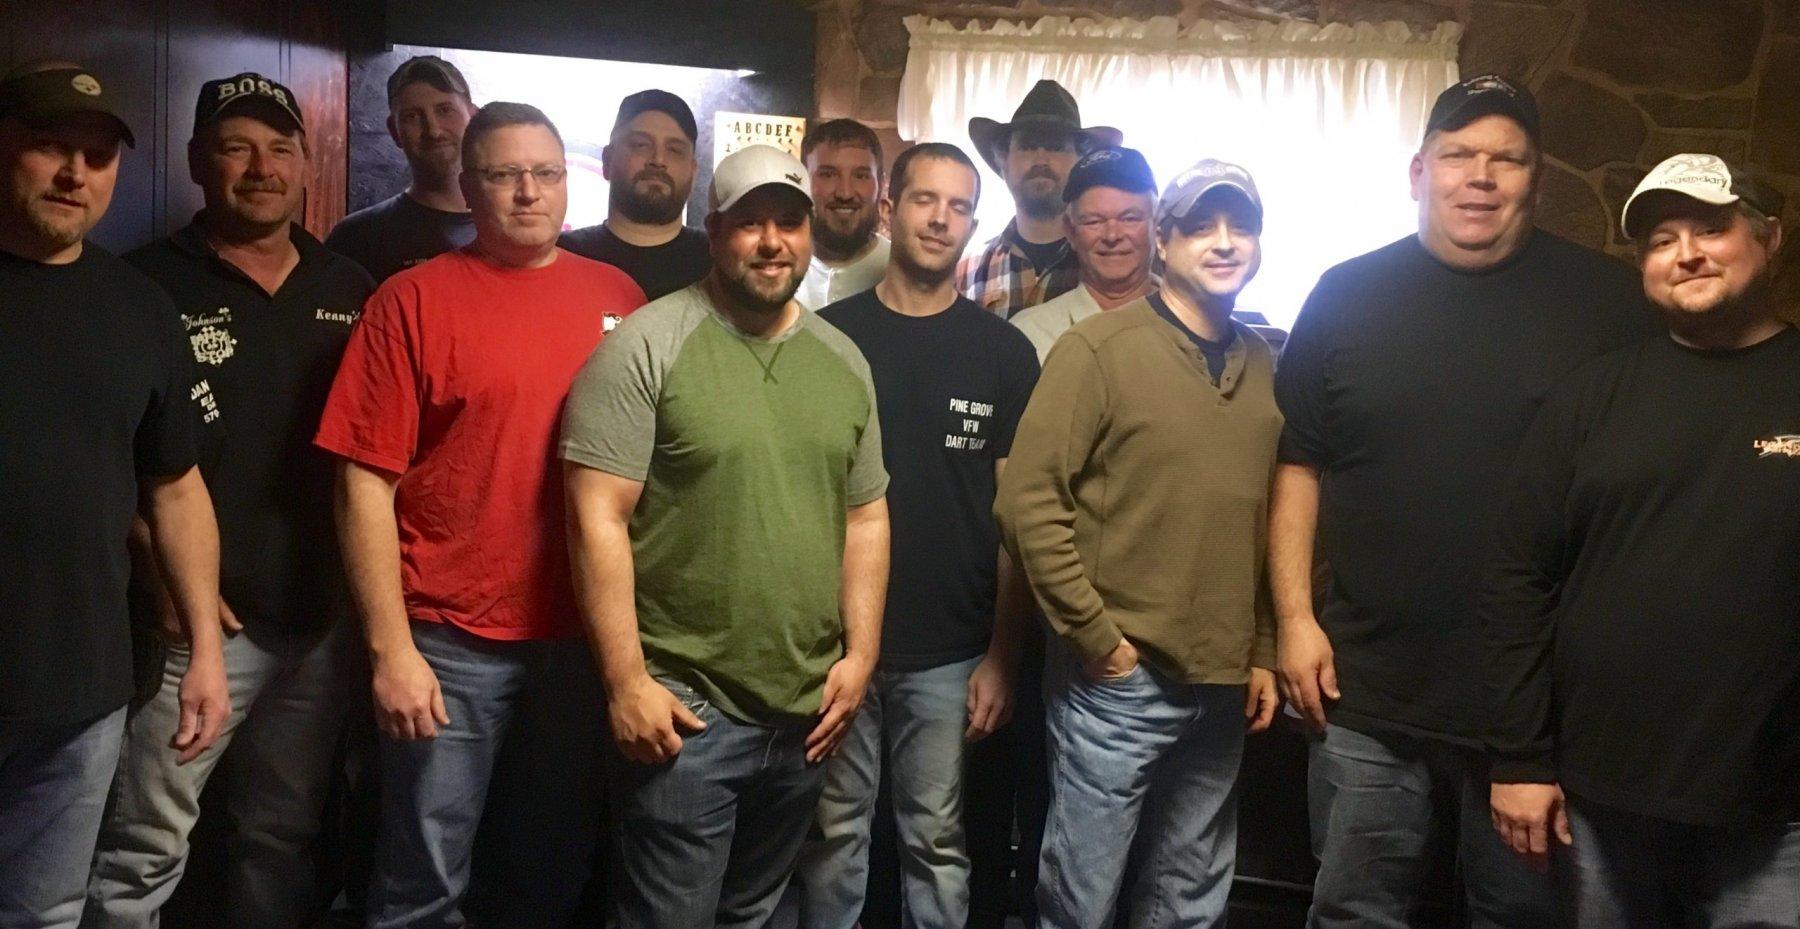 2016 Big Dog Team Photo